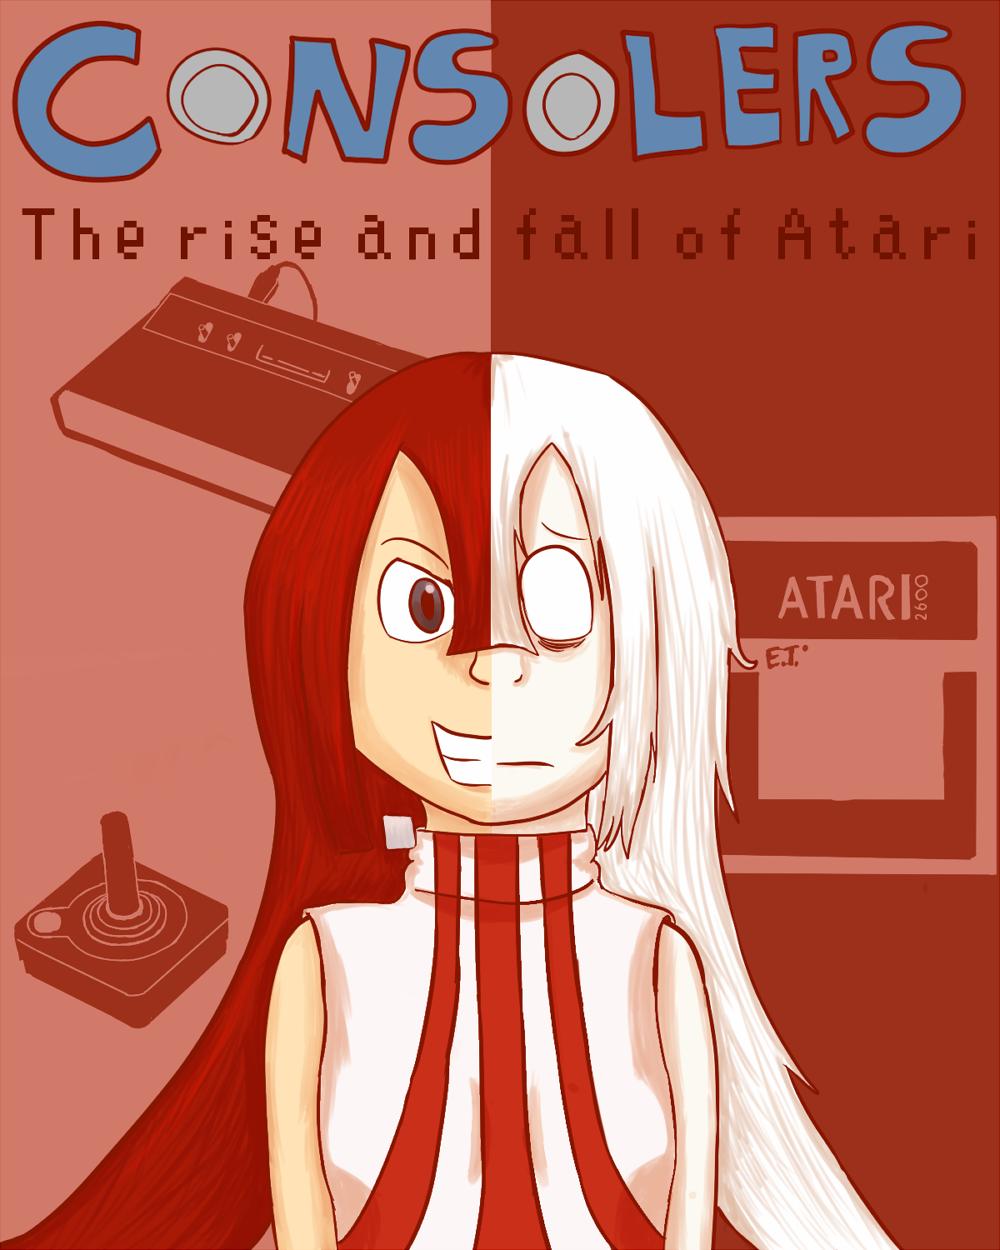 Rise and Fall of Atari - Cover